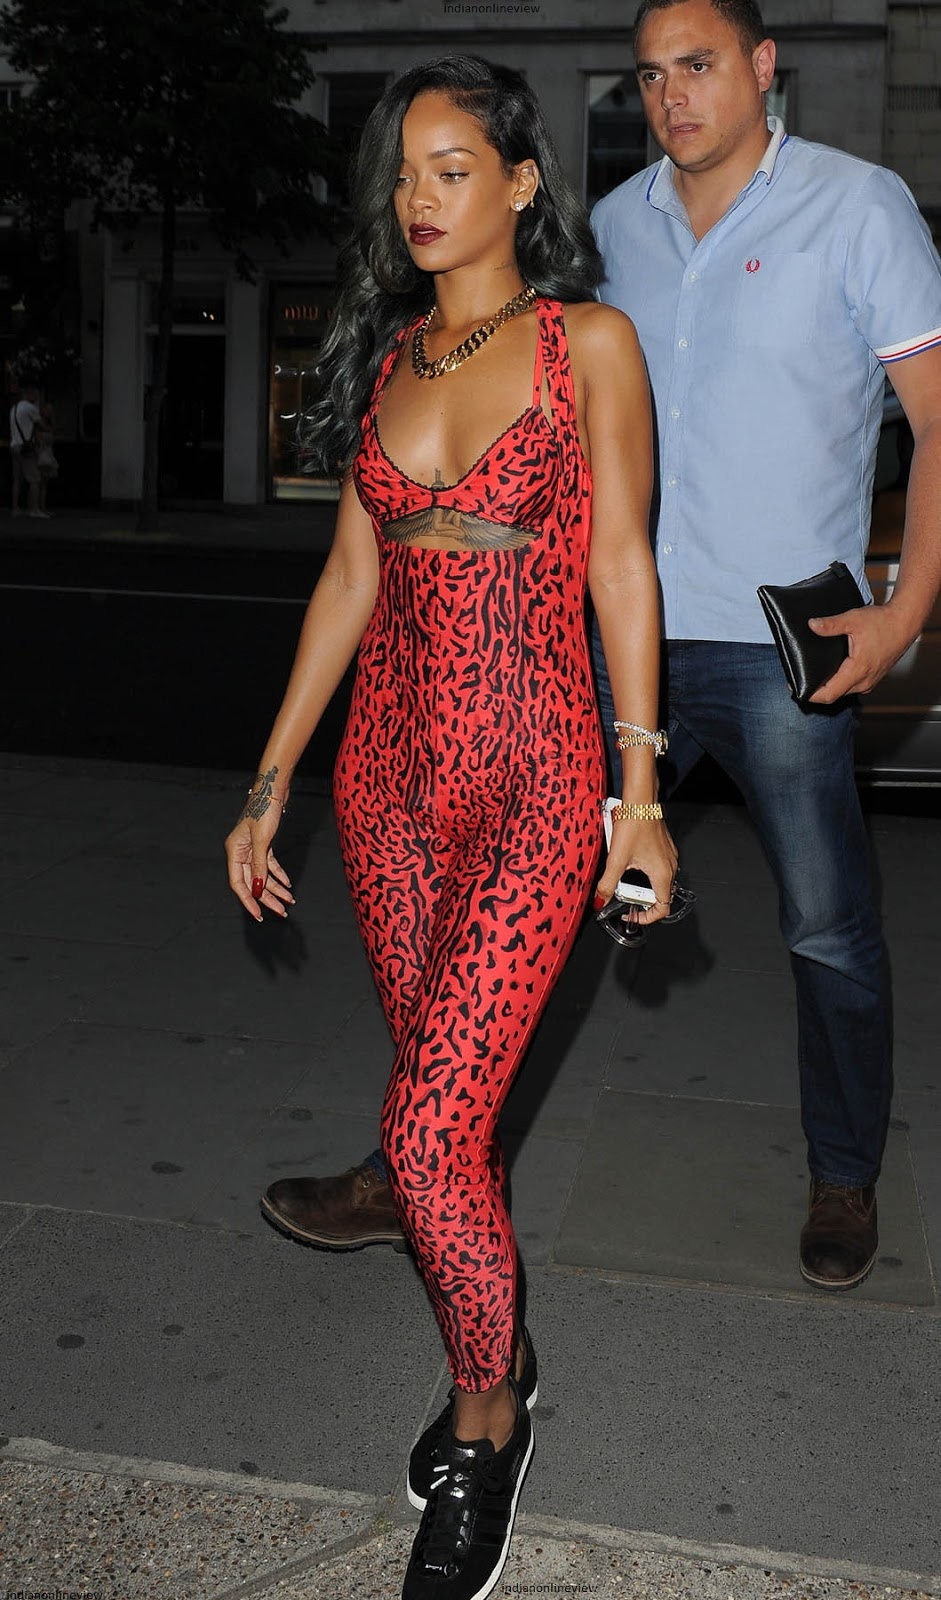 Rihanna date of birth in Melbourne